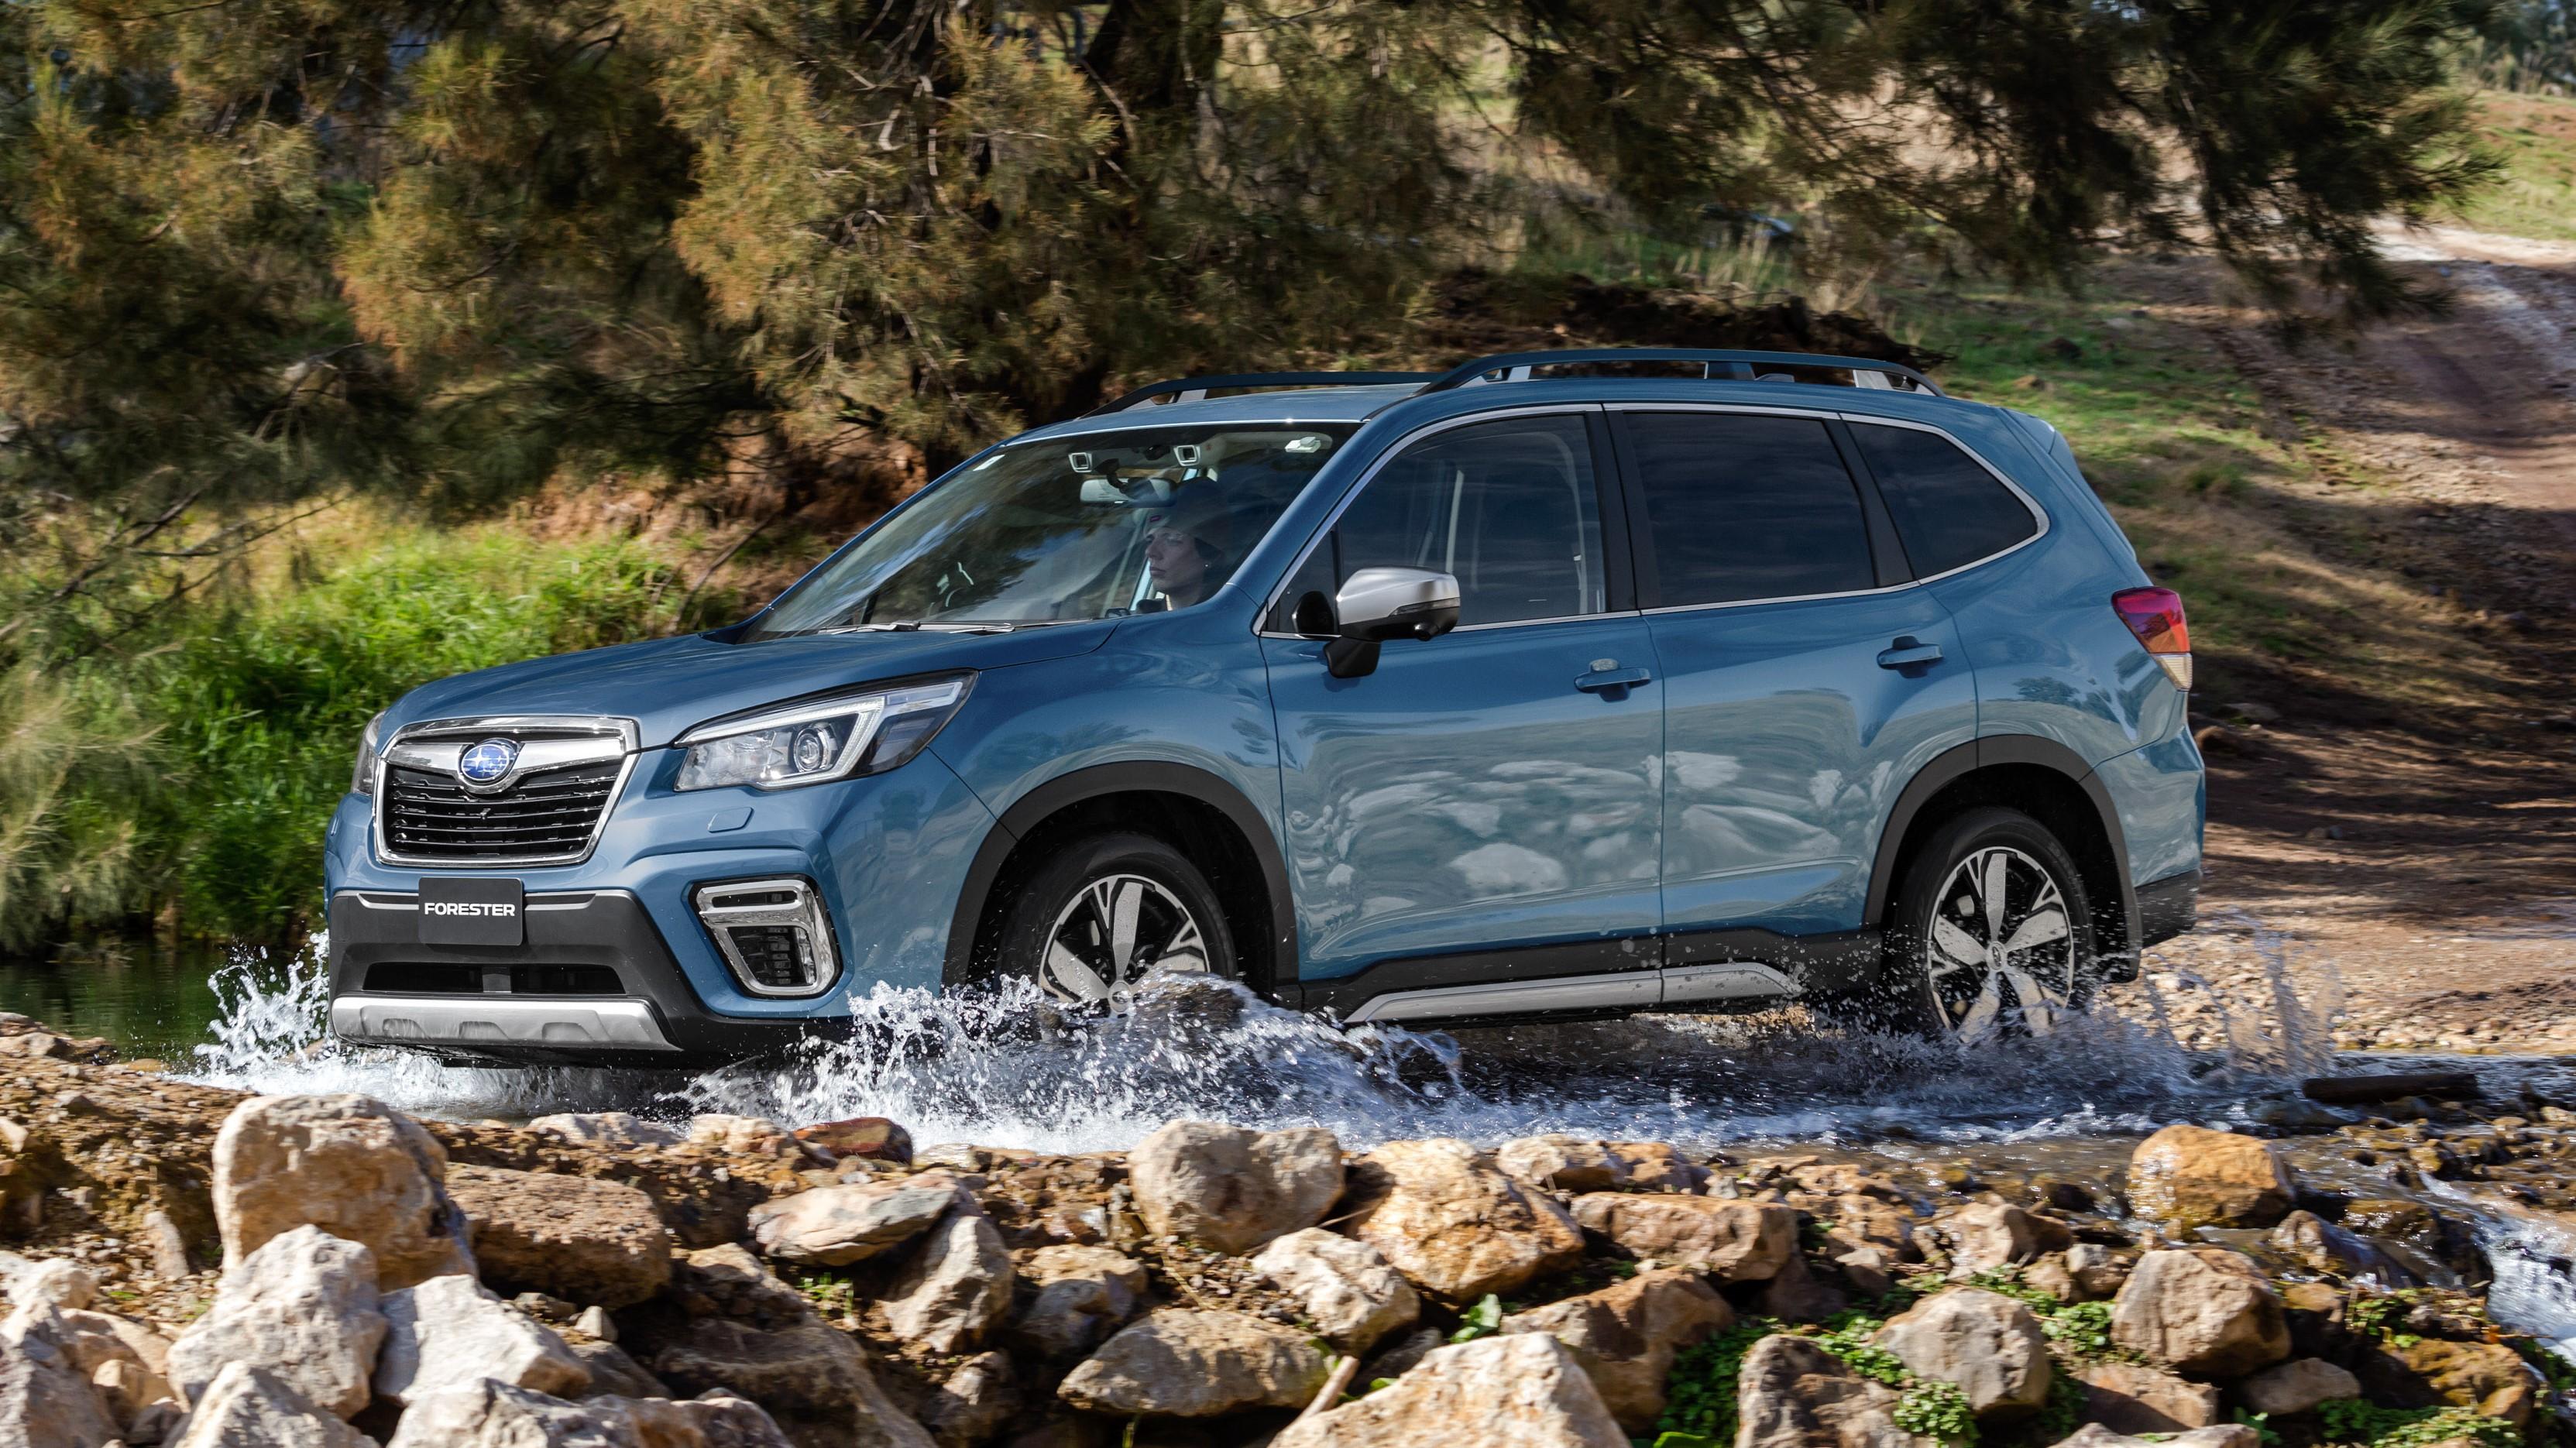 2018 Subaru Forester 2.5i-S.